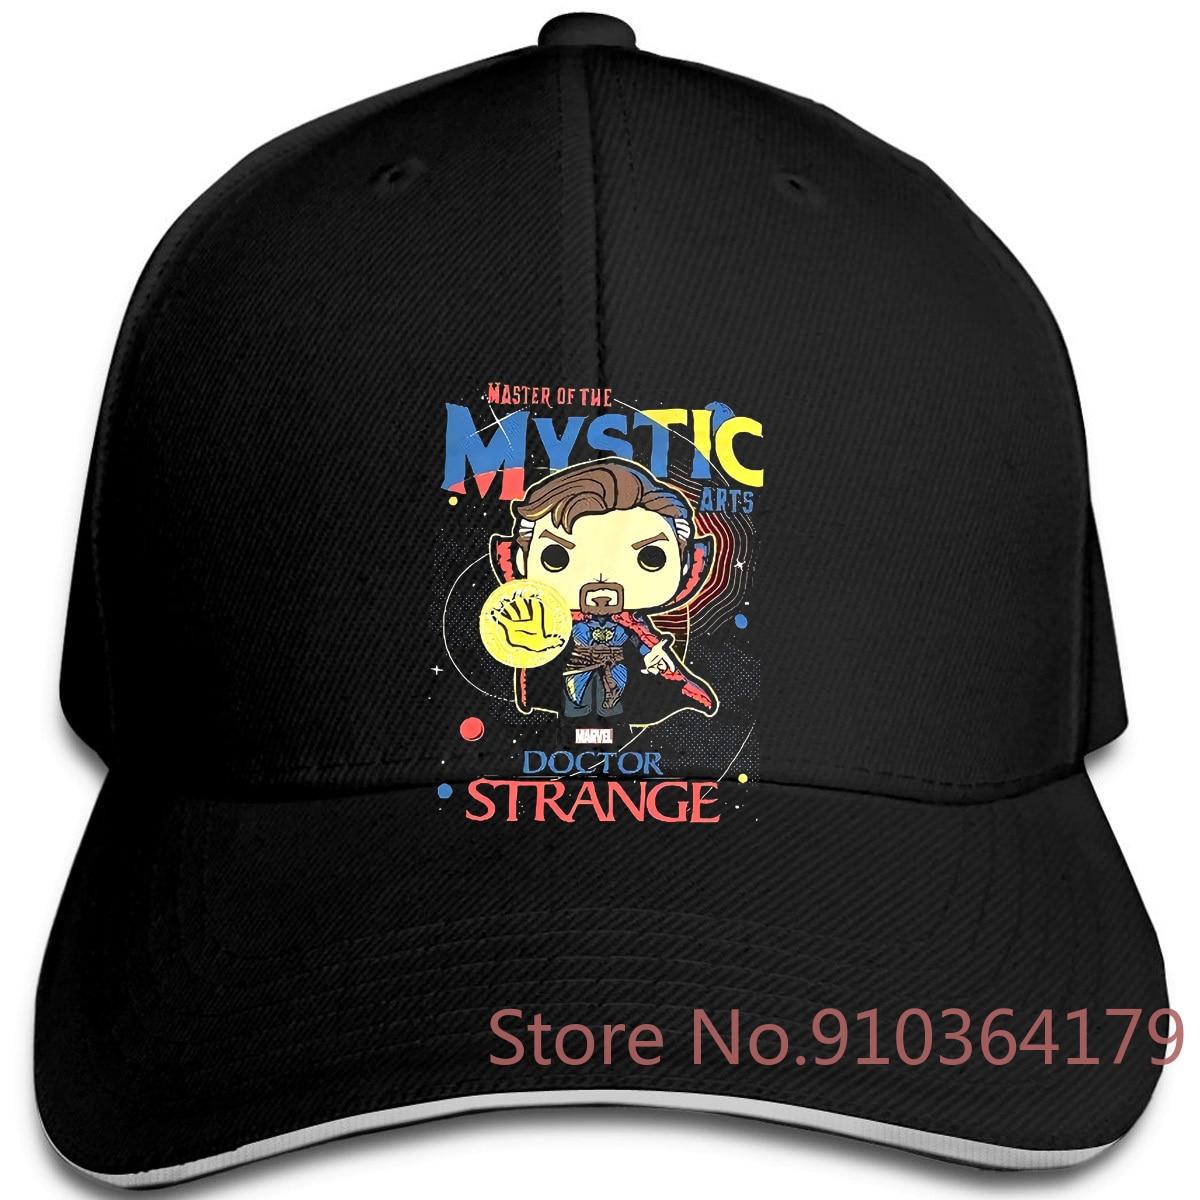 Dr Strange Funko Pop Marvel Master Mystic Arts NWOT gorras ajustables gorra de béisbol hombres mujeres